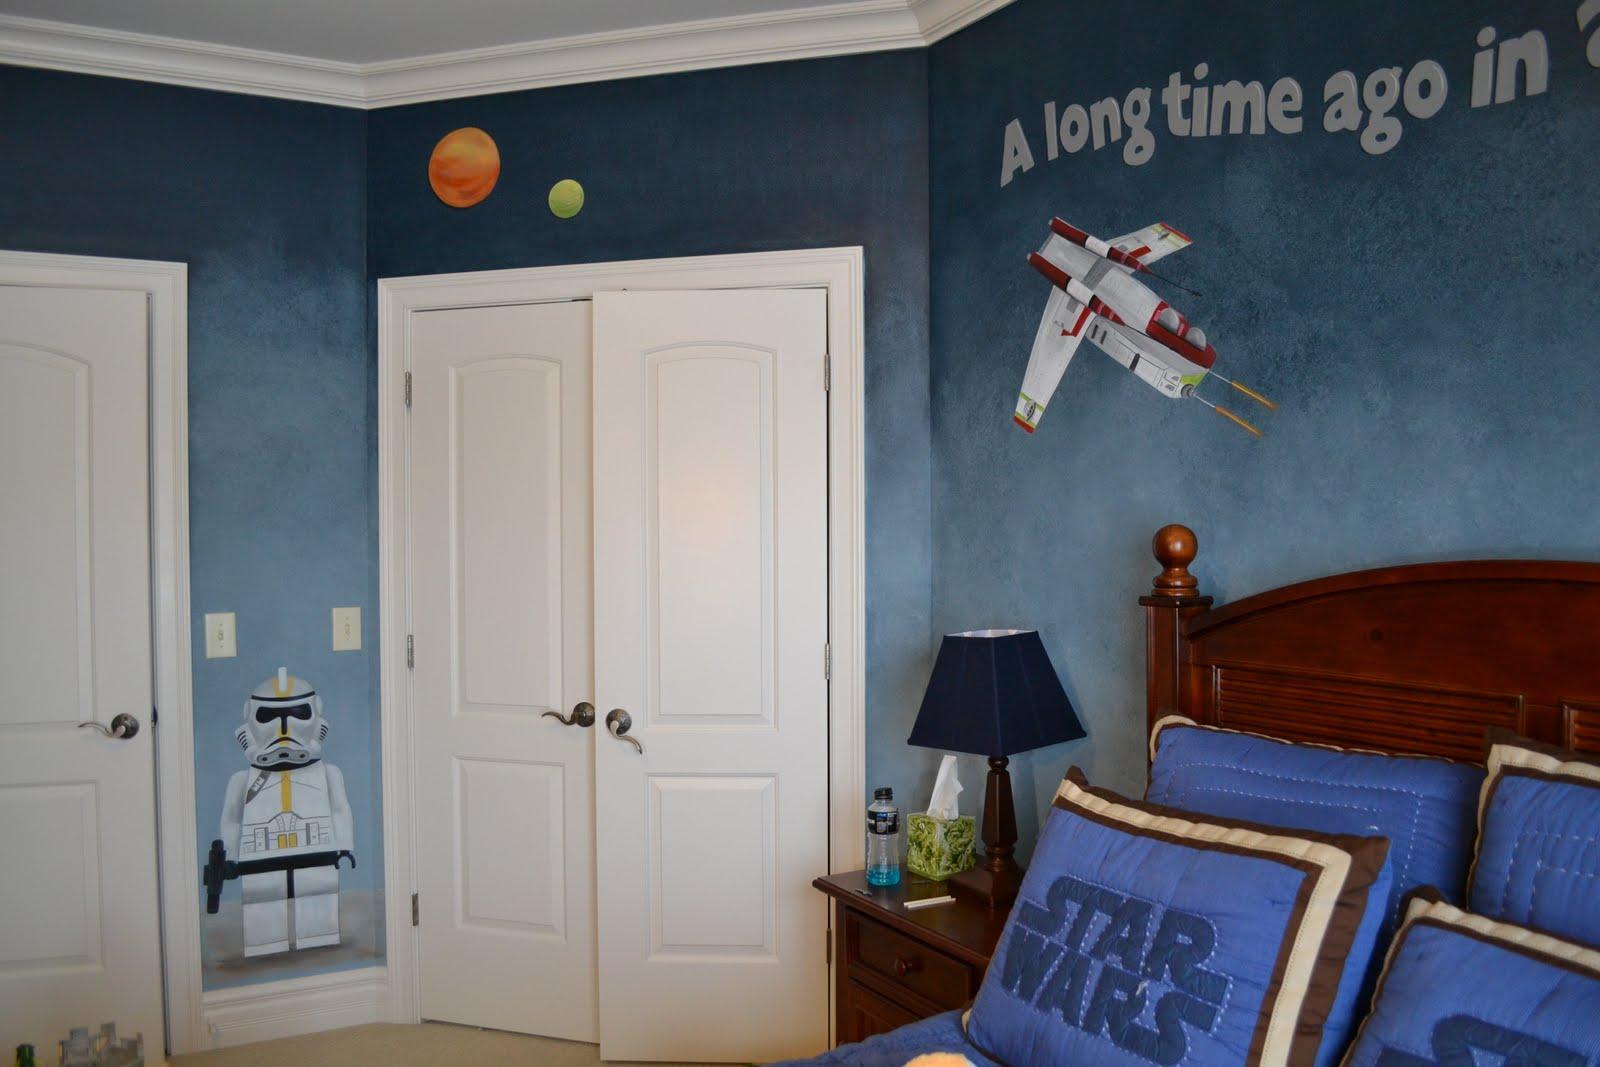 Free Download Star Wars Wallpaper For Kids Room Amazing Star Wars Bedroomjpg 1600x1067 For Your Desktop Mobile Tablet Explore 49 Star Wars Wallpaper For Room Star Wars Wallpaper Border